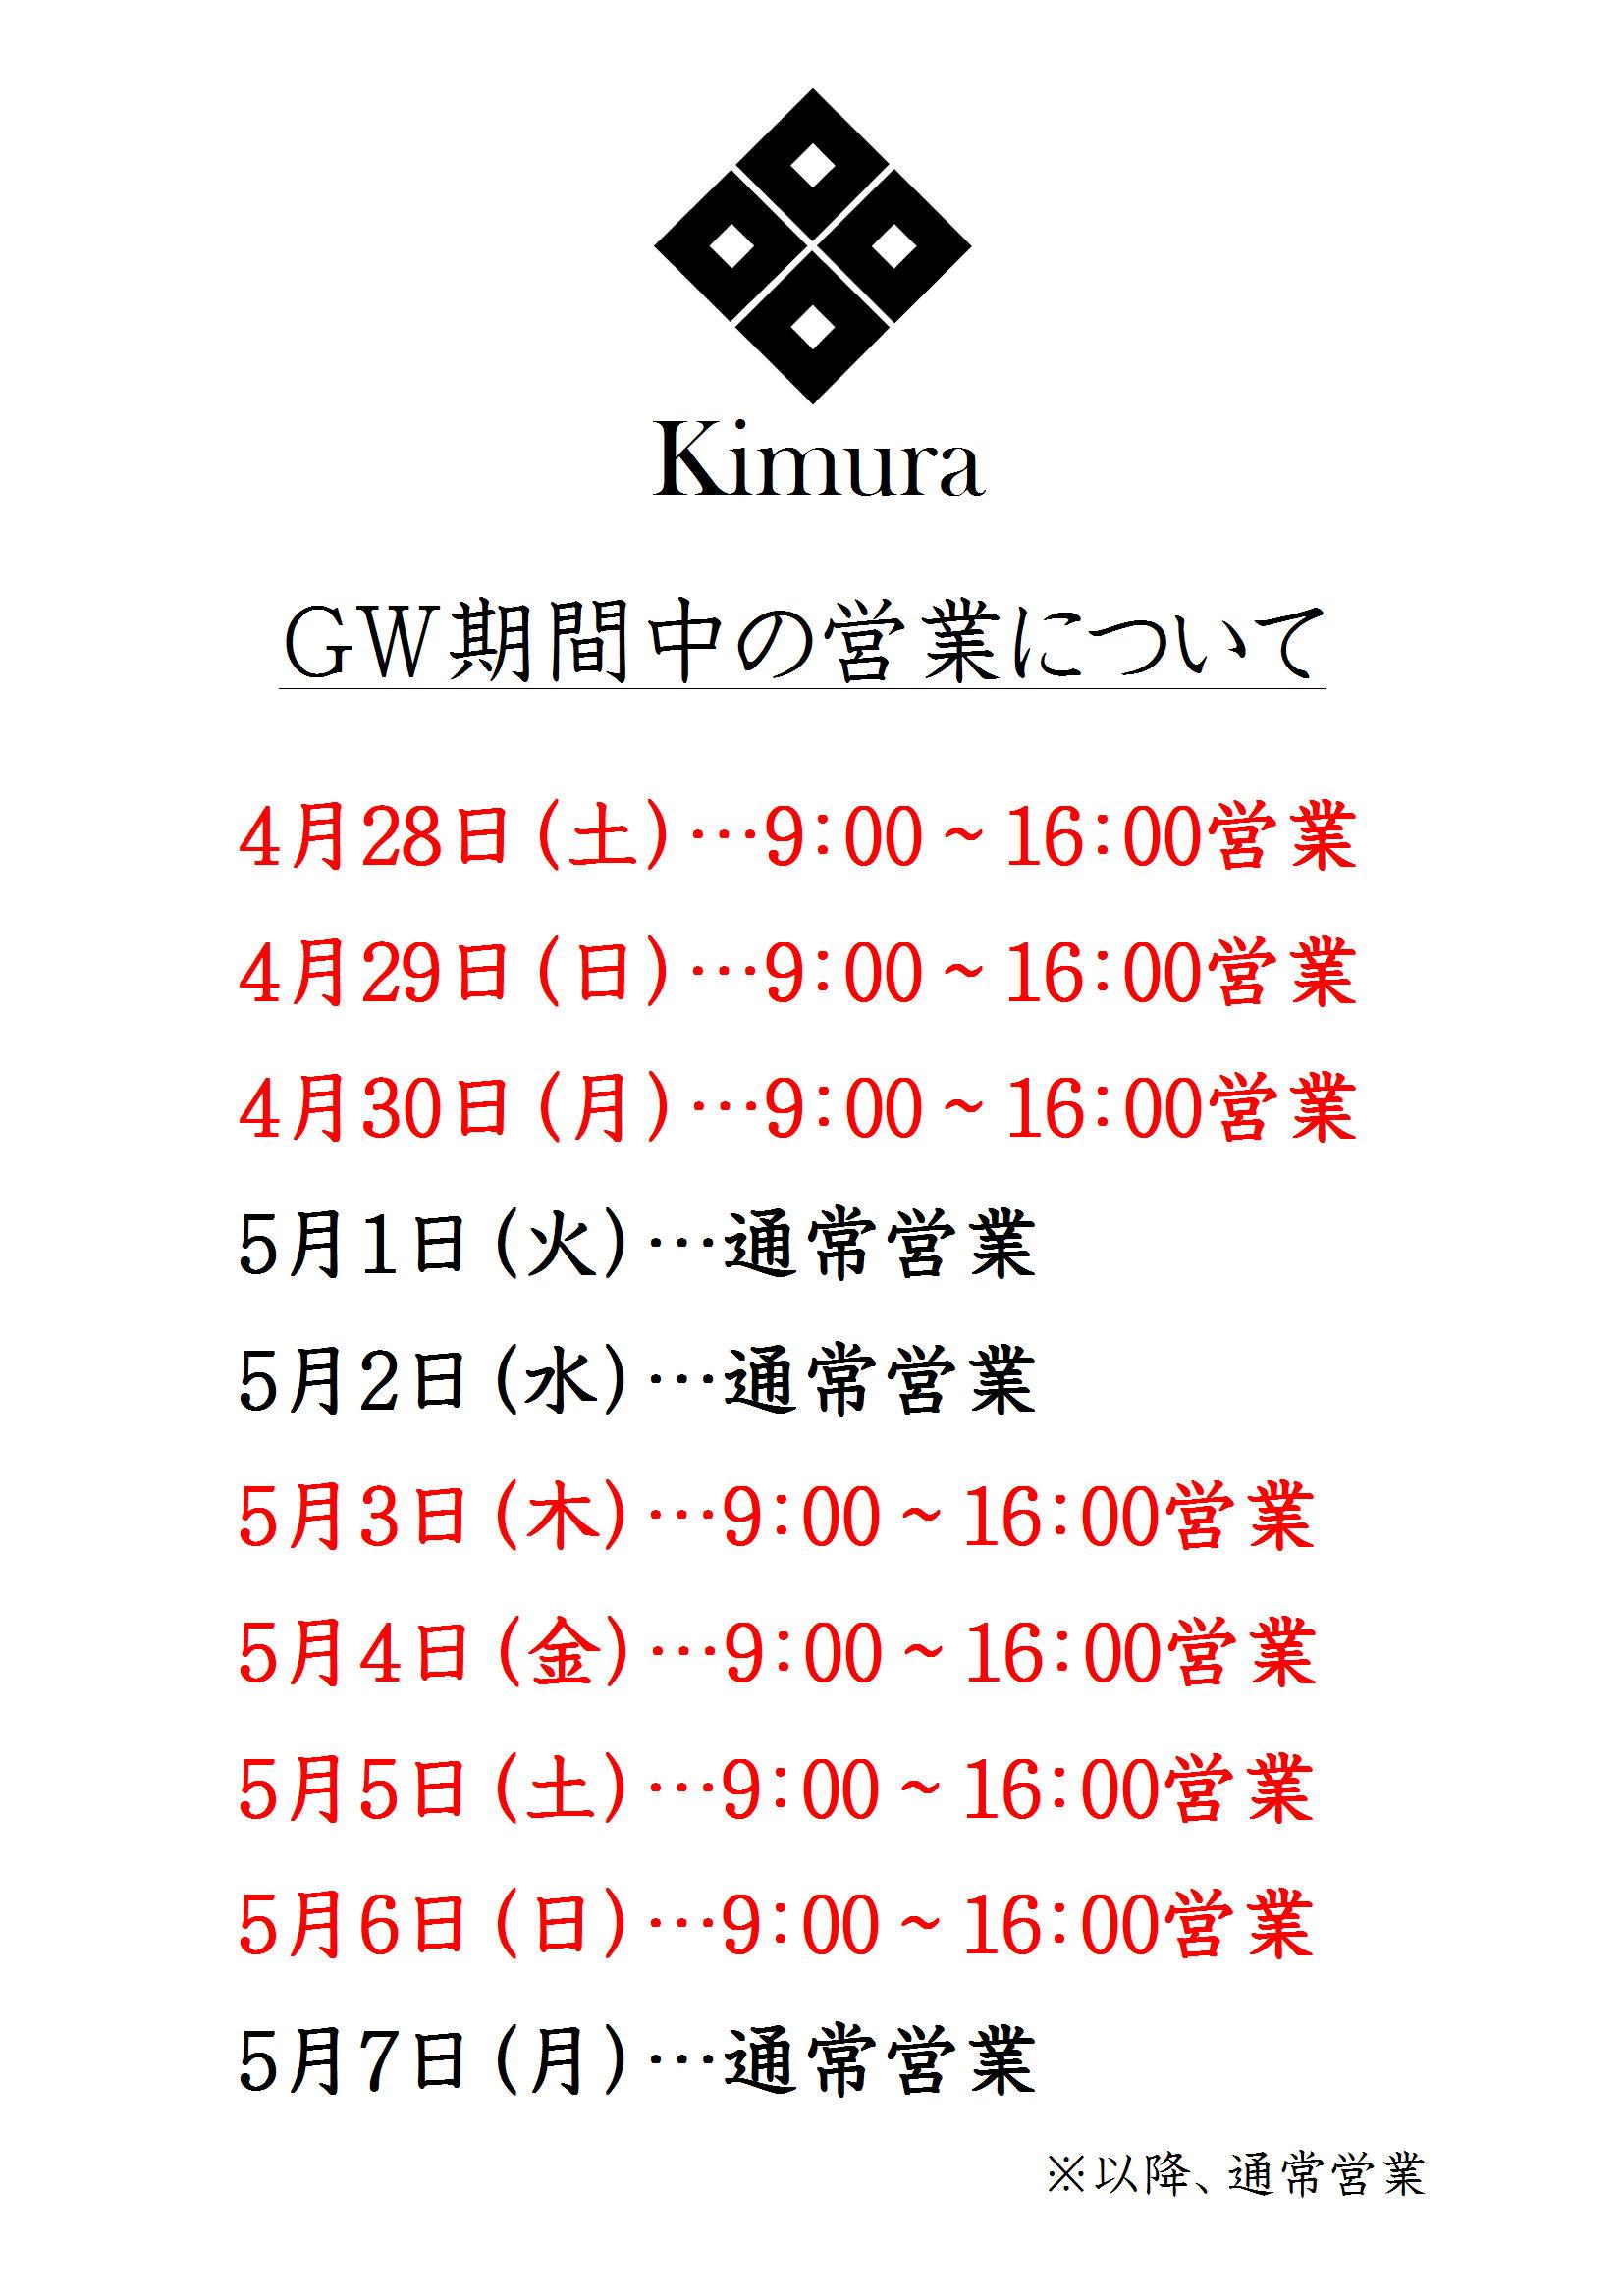 http://www.fukukomachi.com/blog/photo/20180424-2.JPG